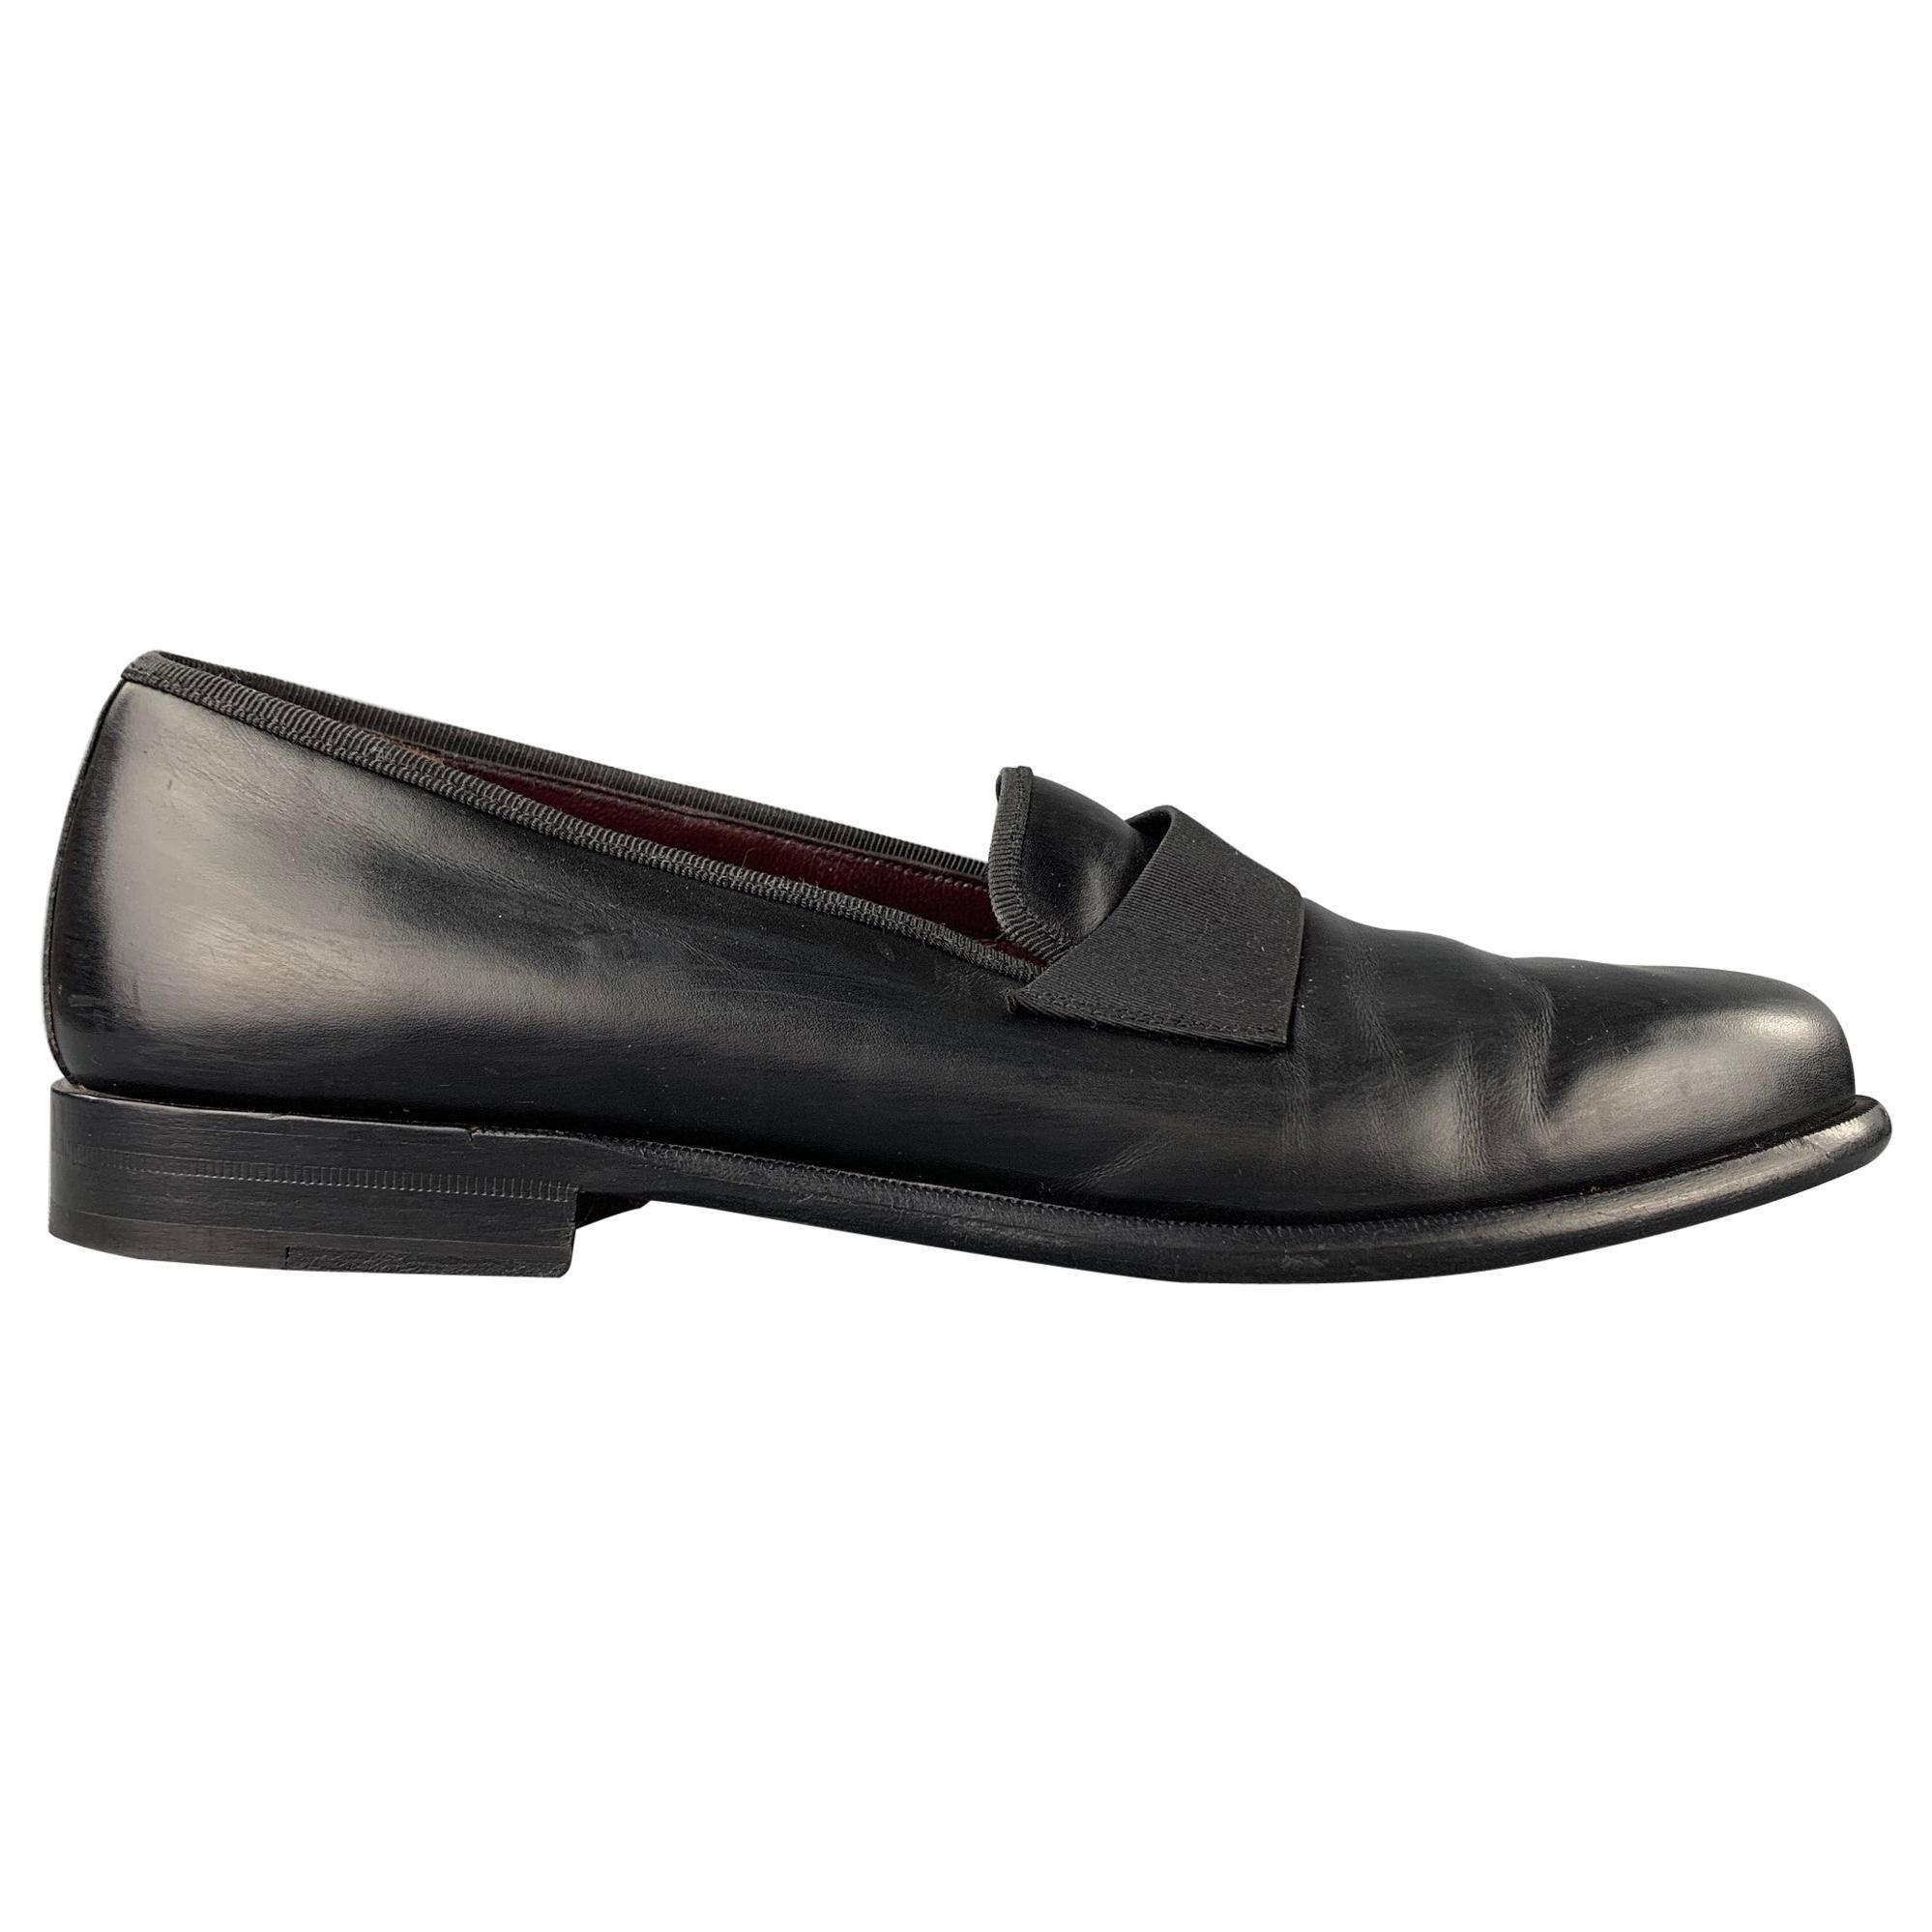 SALVATORE FERRAGAMO Size 11 Black Leather Slip On Loafers